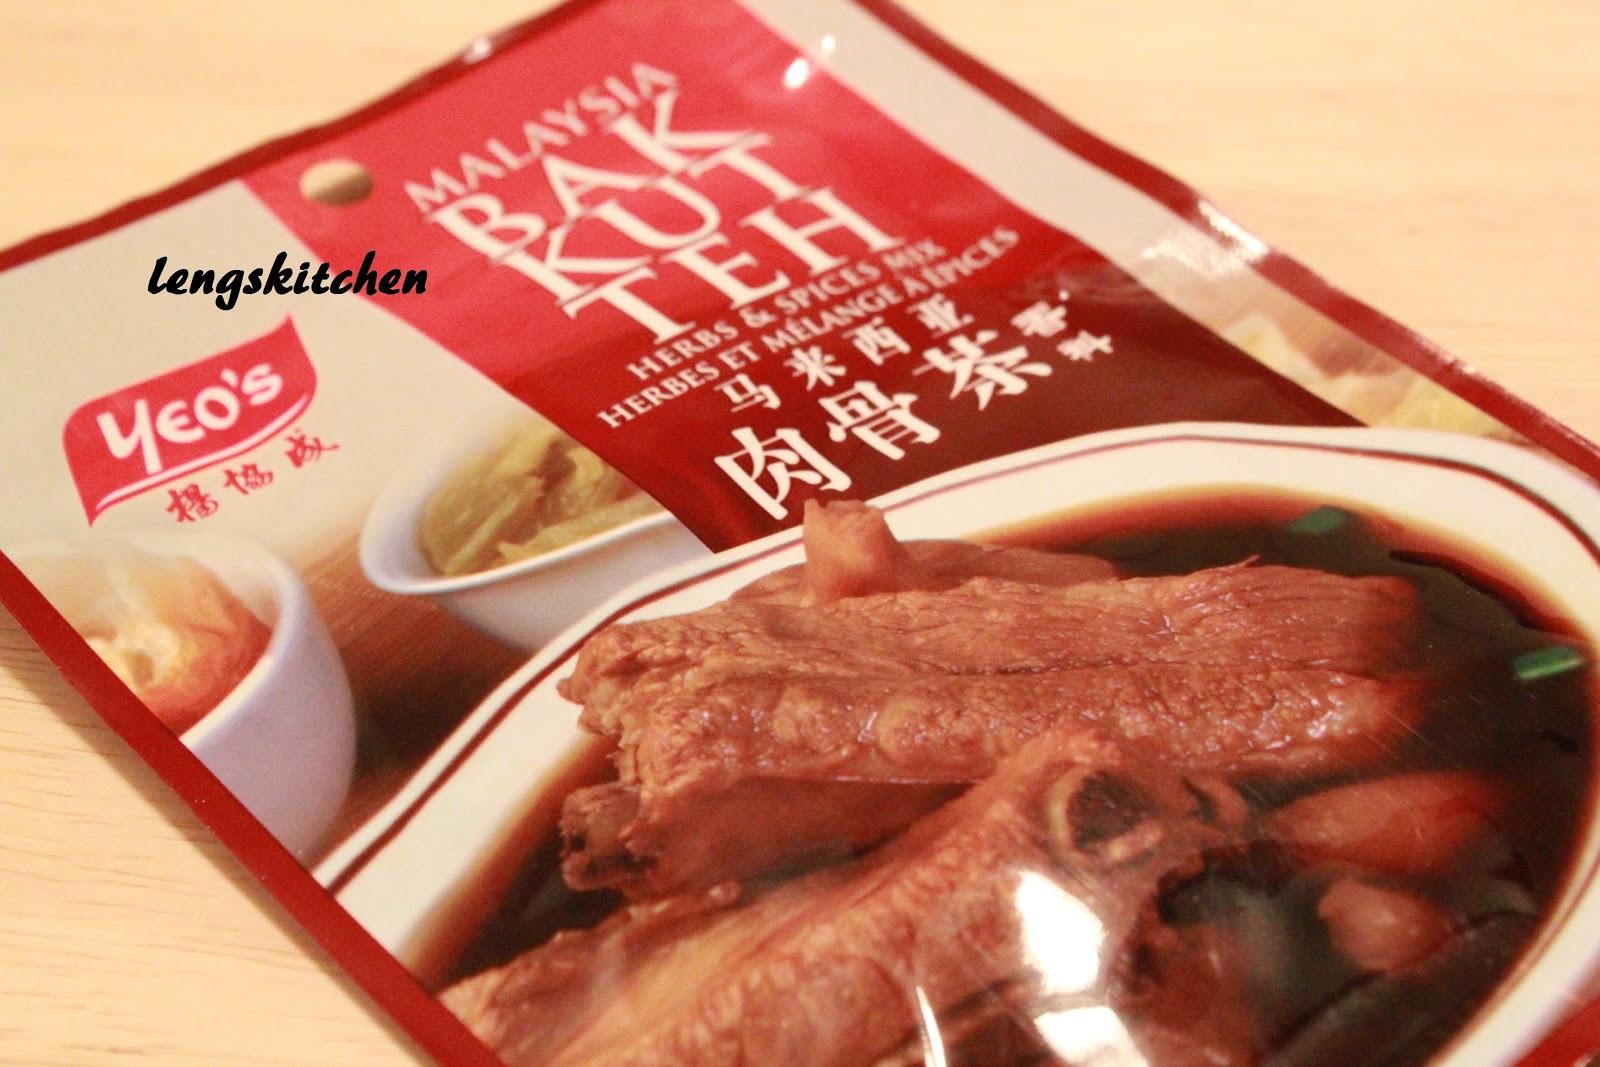 Kitchen Chaos: Bak Kut Teh (Spare Ribs Soup) 肉骨茶